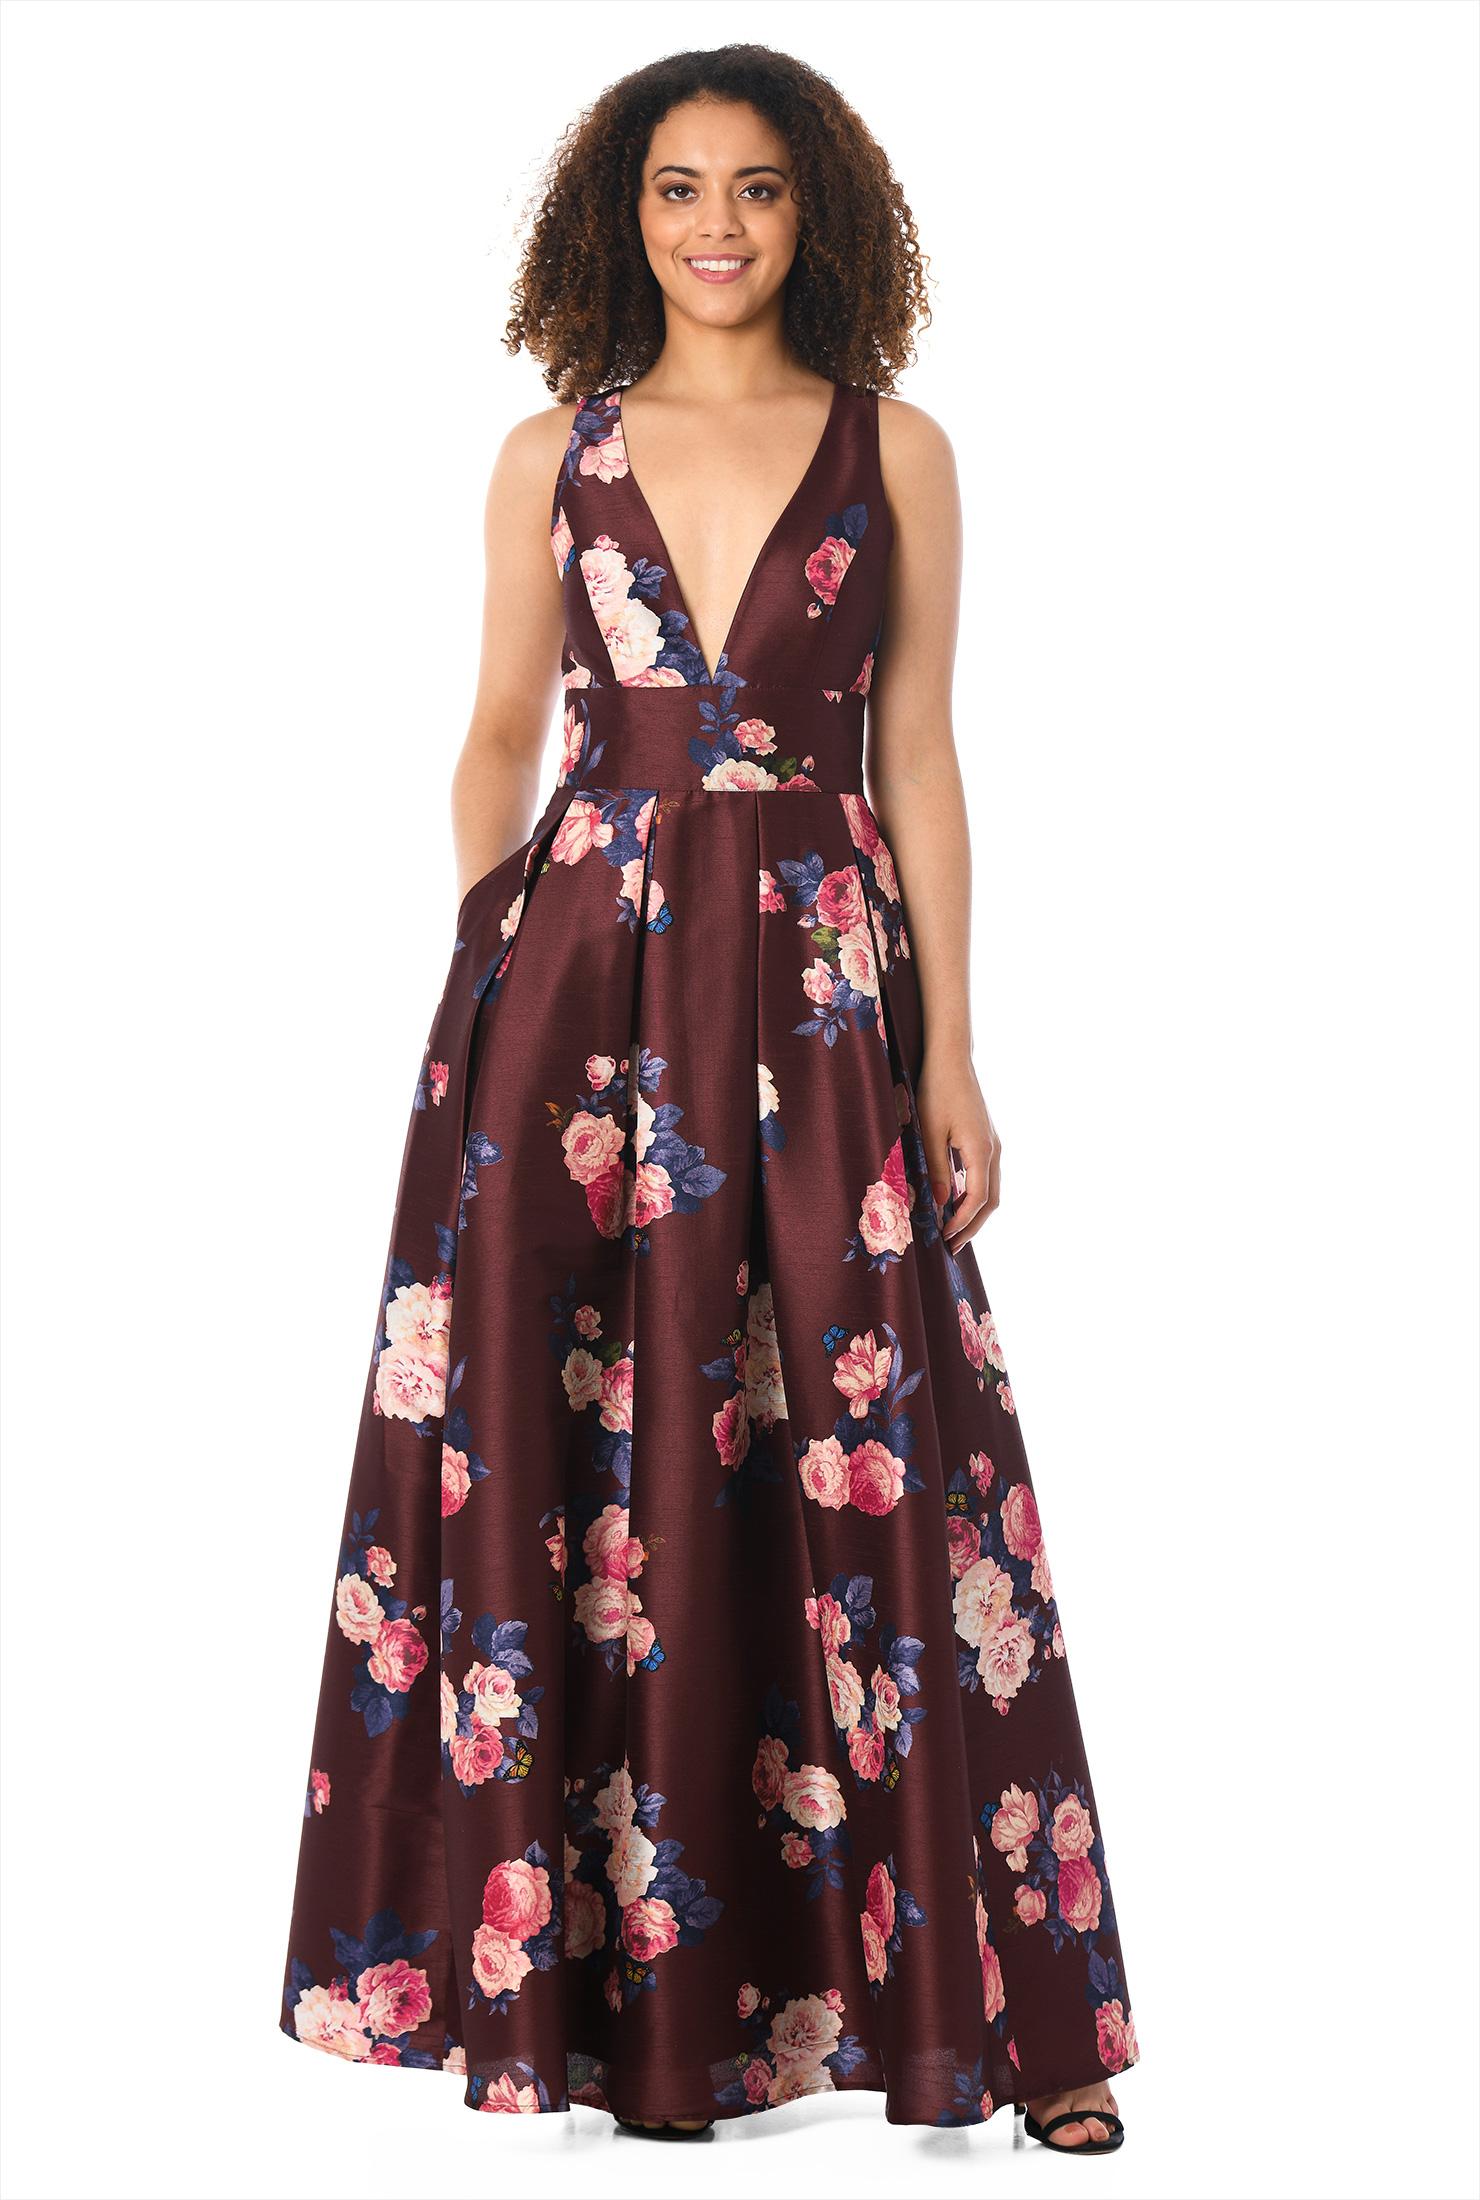 Plunge rose print dupioni dress